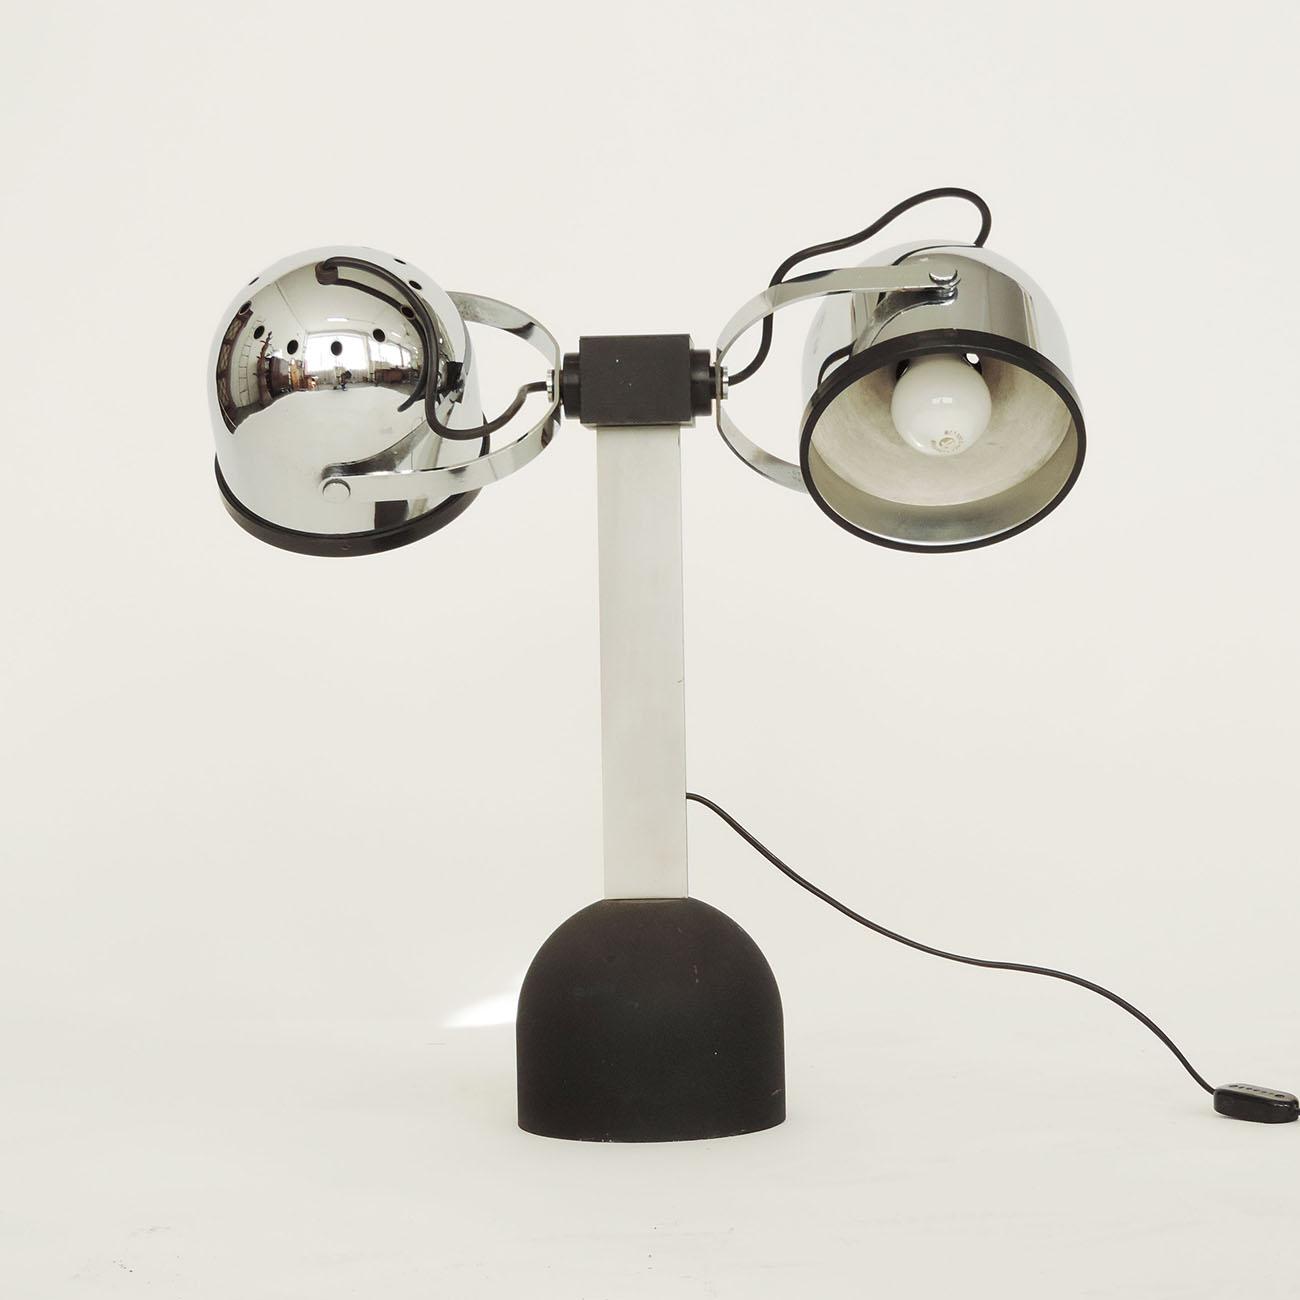 Pair of Gae Aulenti & Livio Castiglioni Trepiù Table Lamps for Stilnovo, 1972